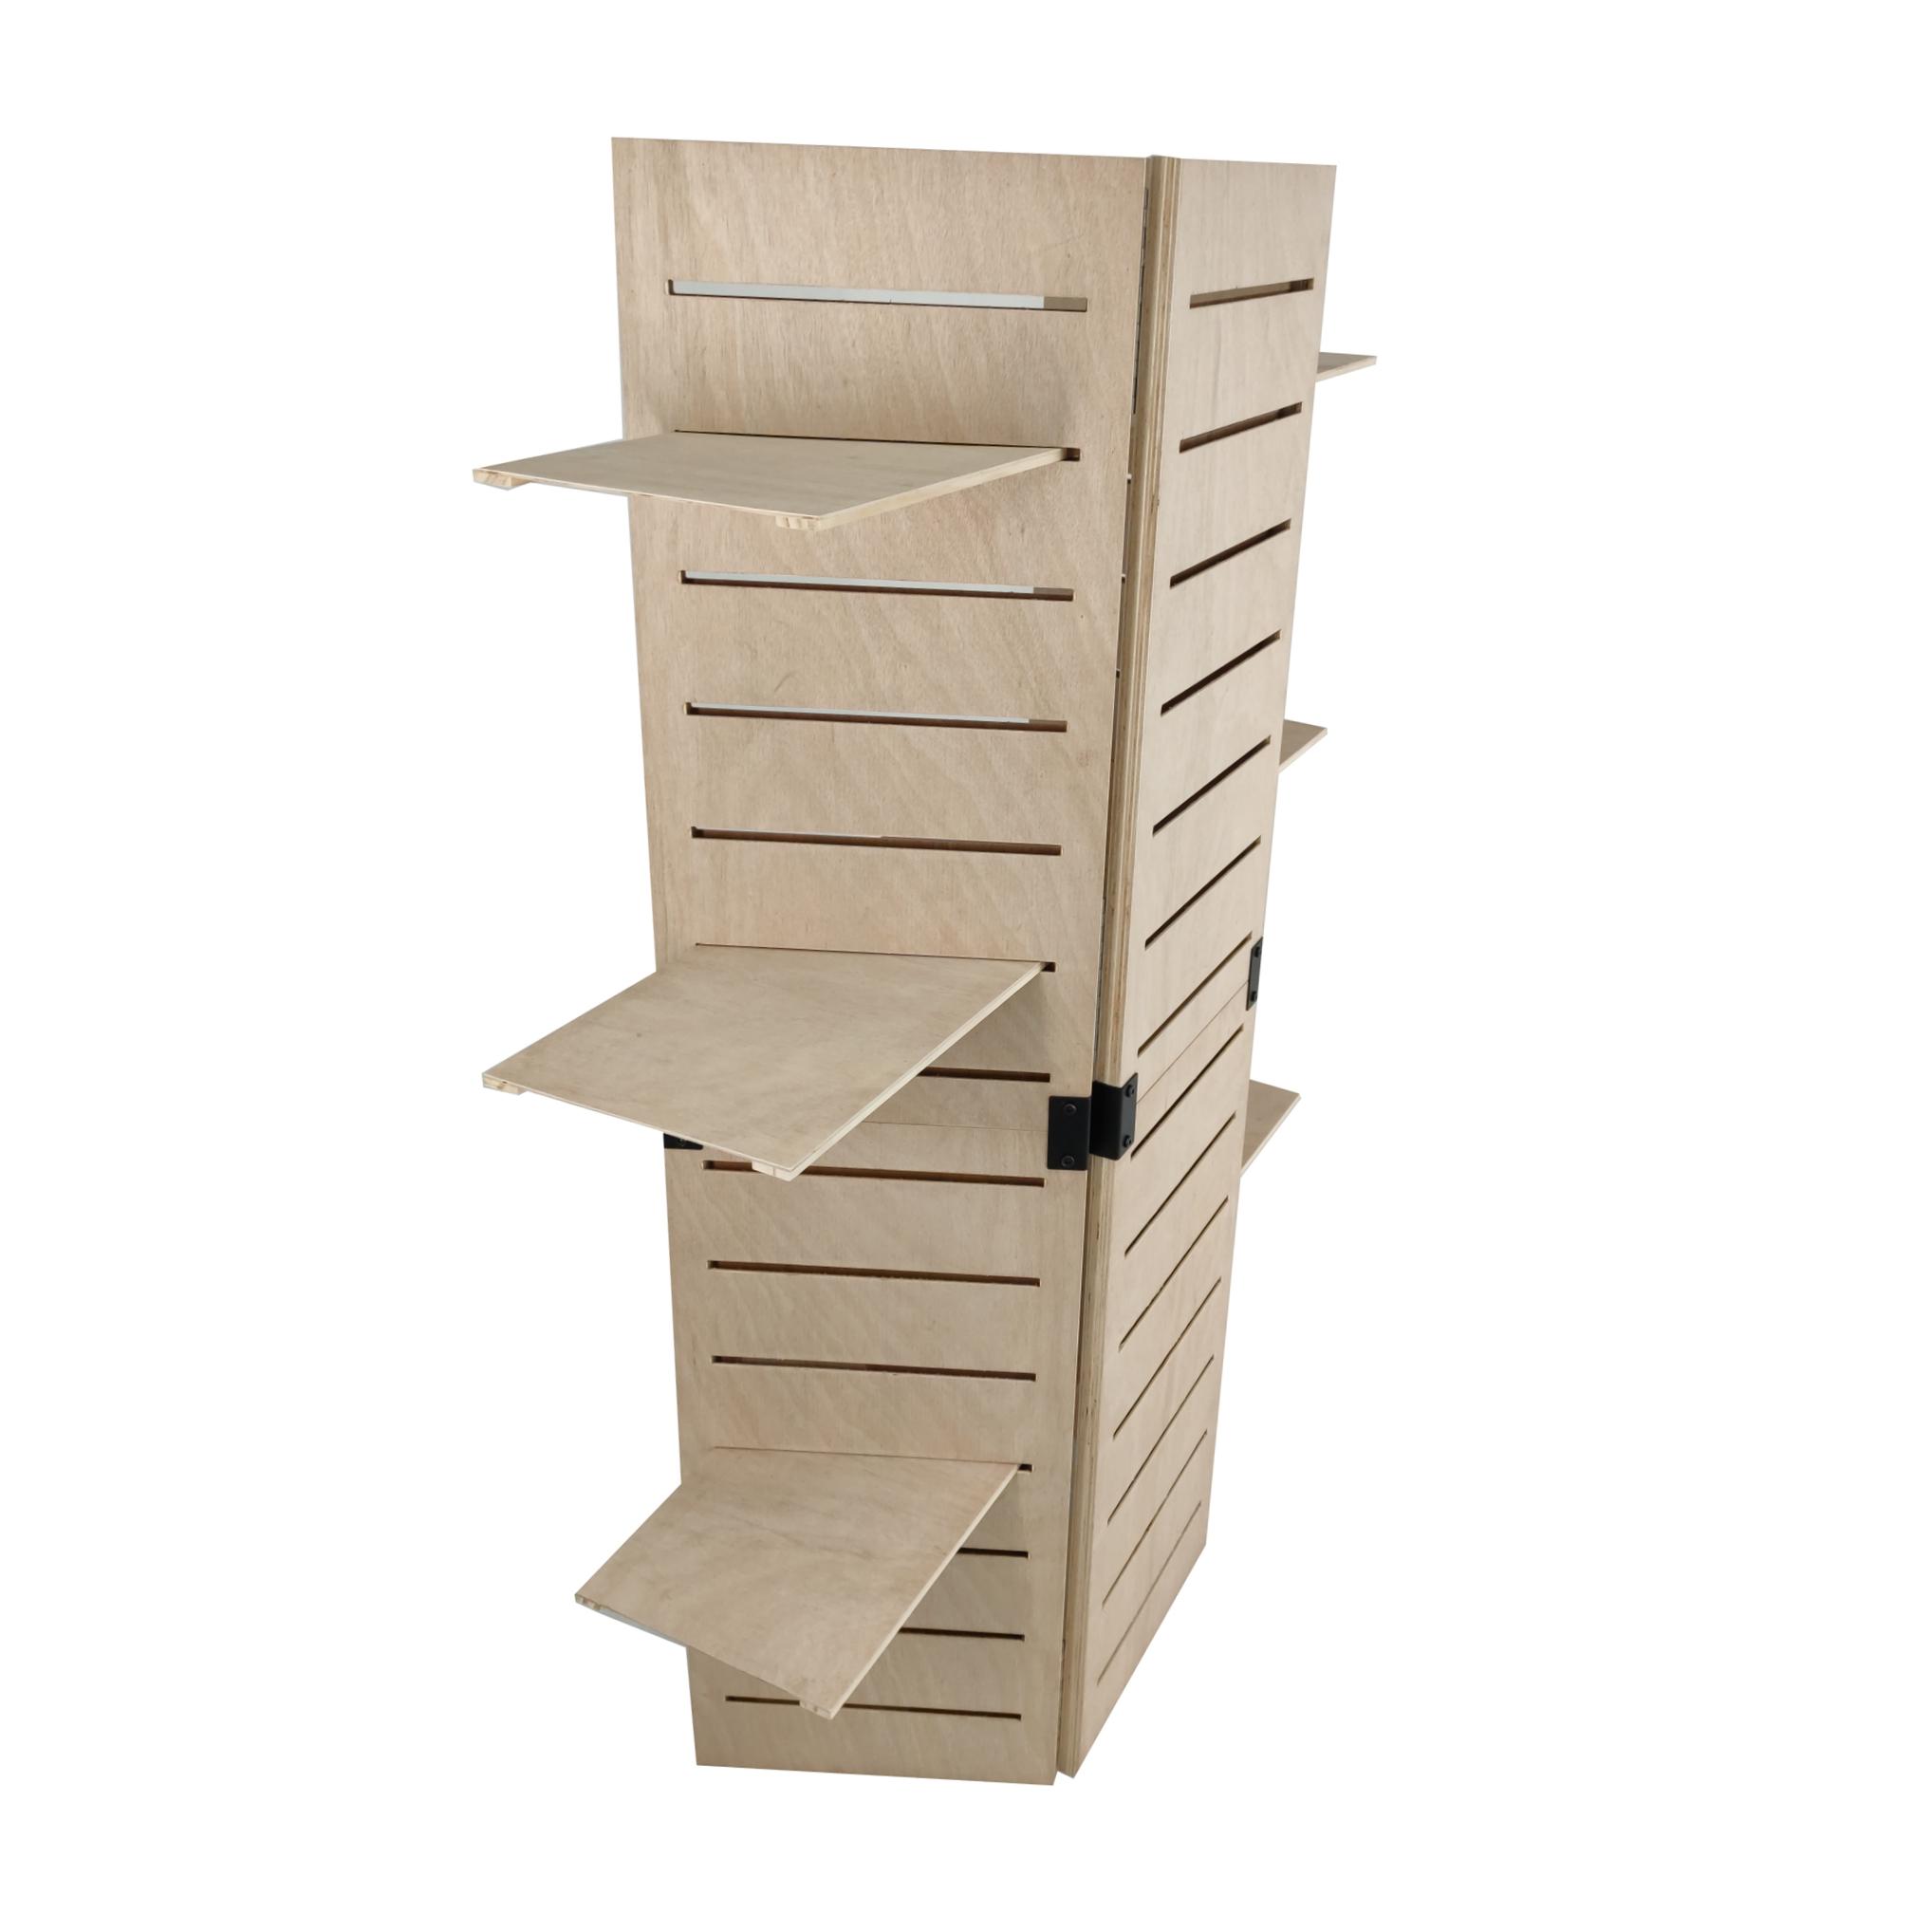 48 0 x 59 5 x 14 5 wooden retail shelving unit w 3. Black Bedroom Furniture Sets. Home Design Ideas